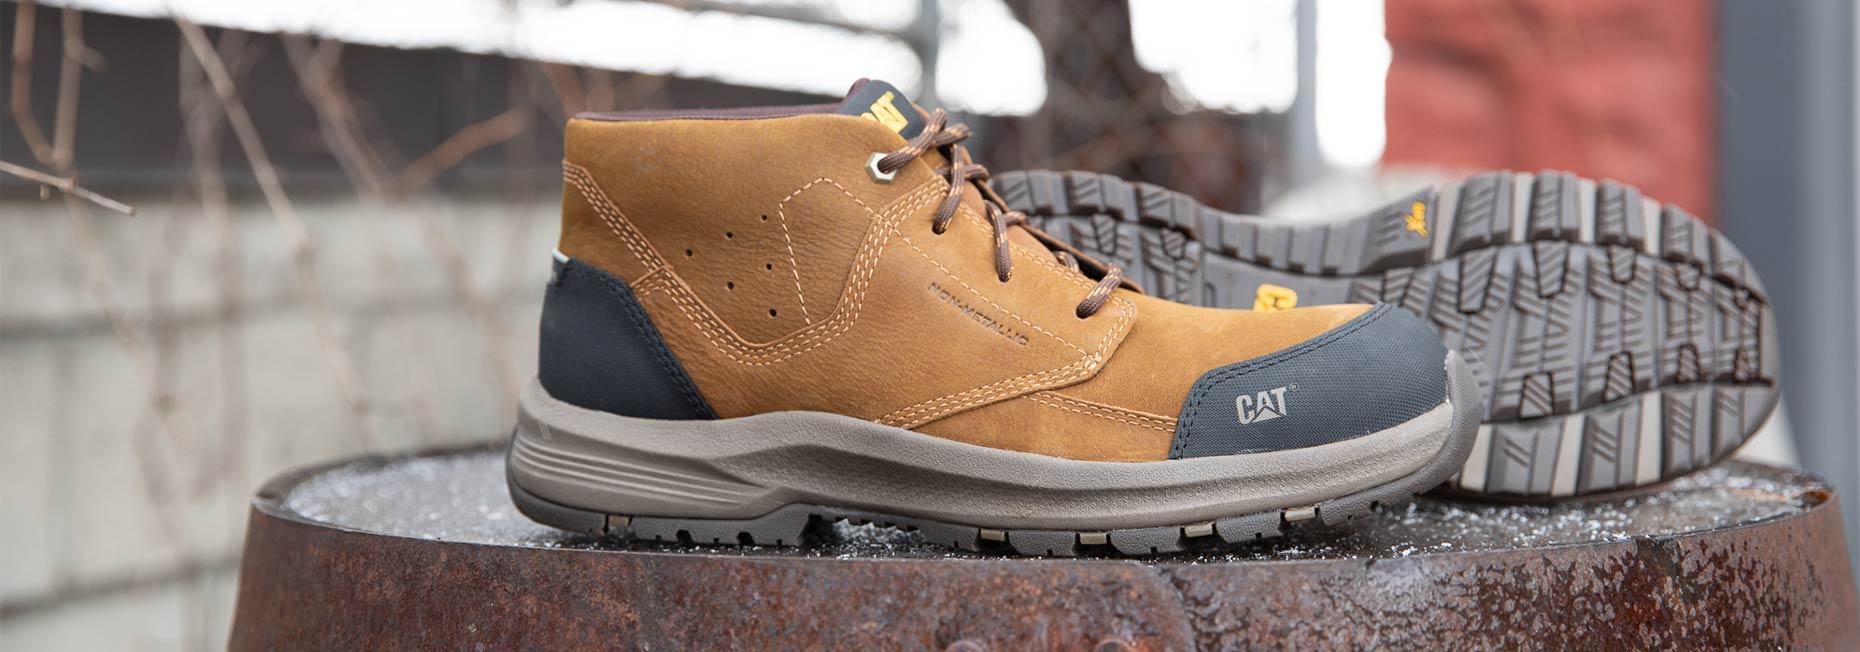 639e1693bc Men's Work Boots - Shop Work Shoes For Men | Cat Footwear